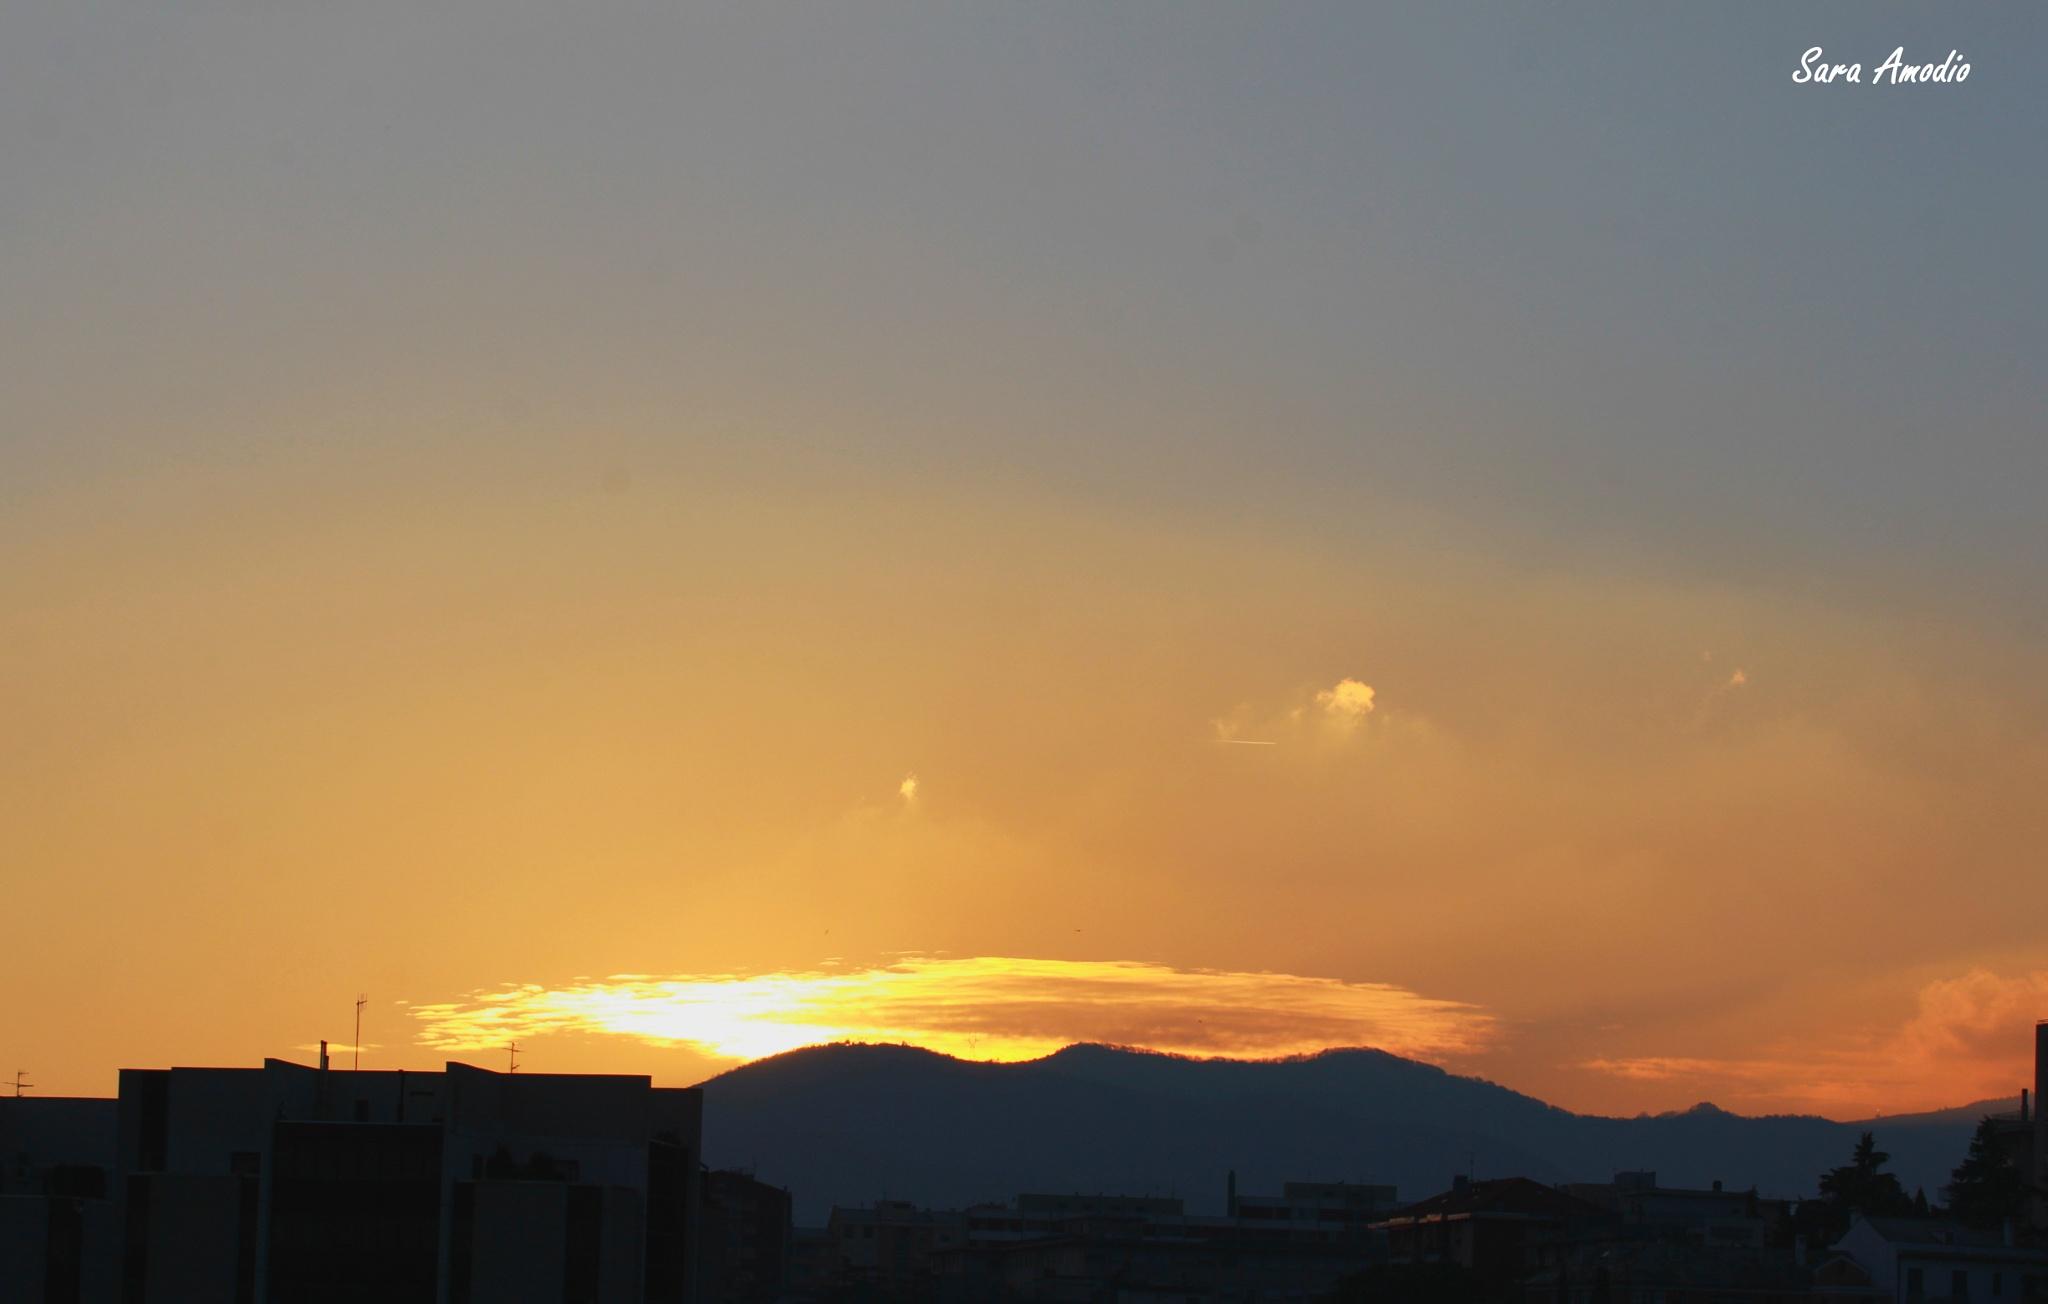 sunset by sara.amodio.77